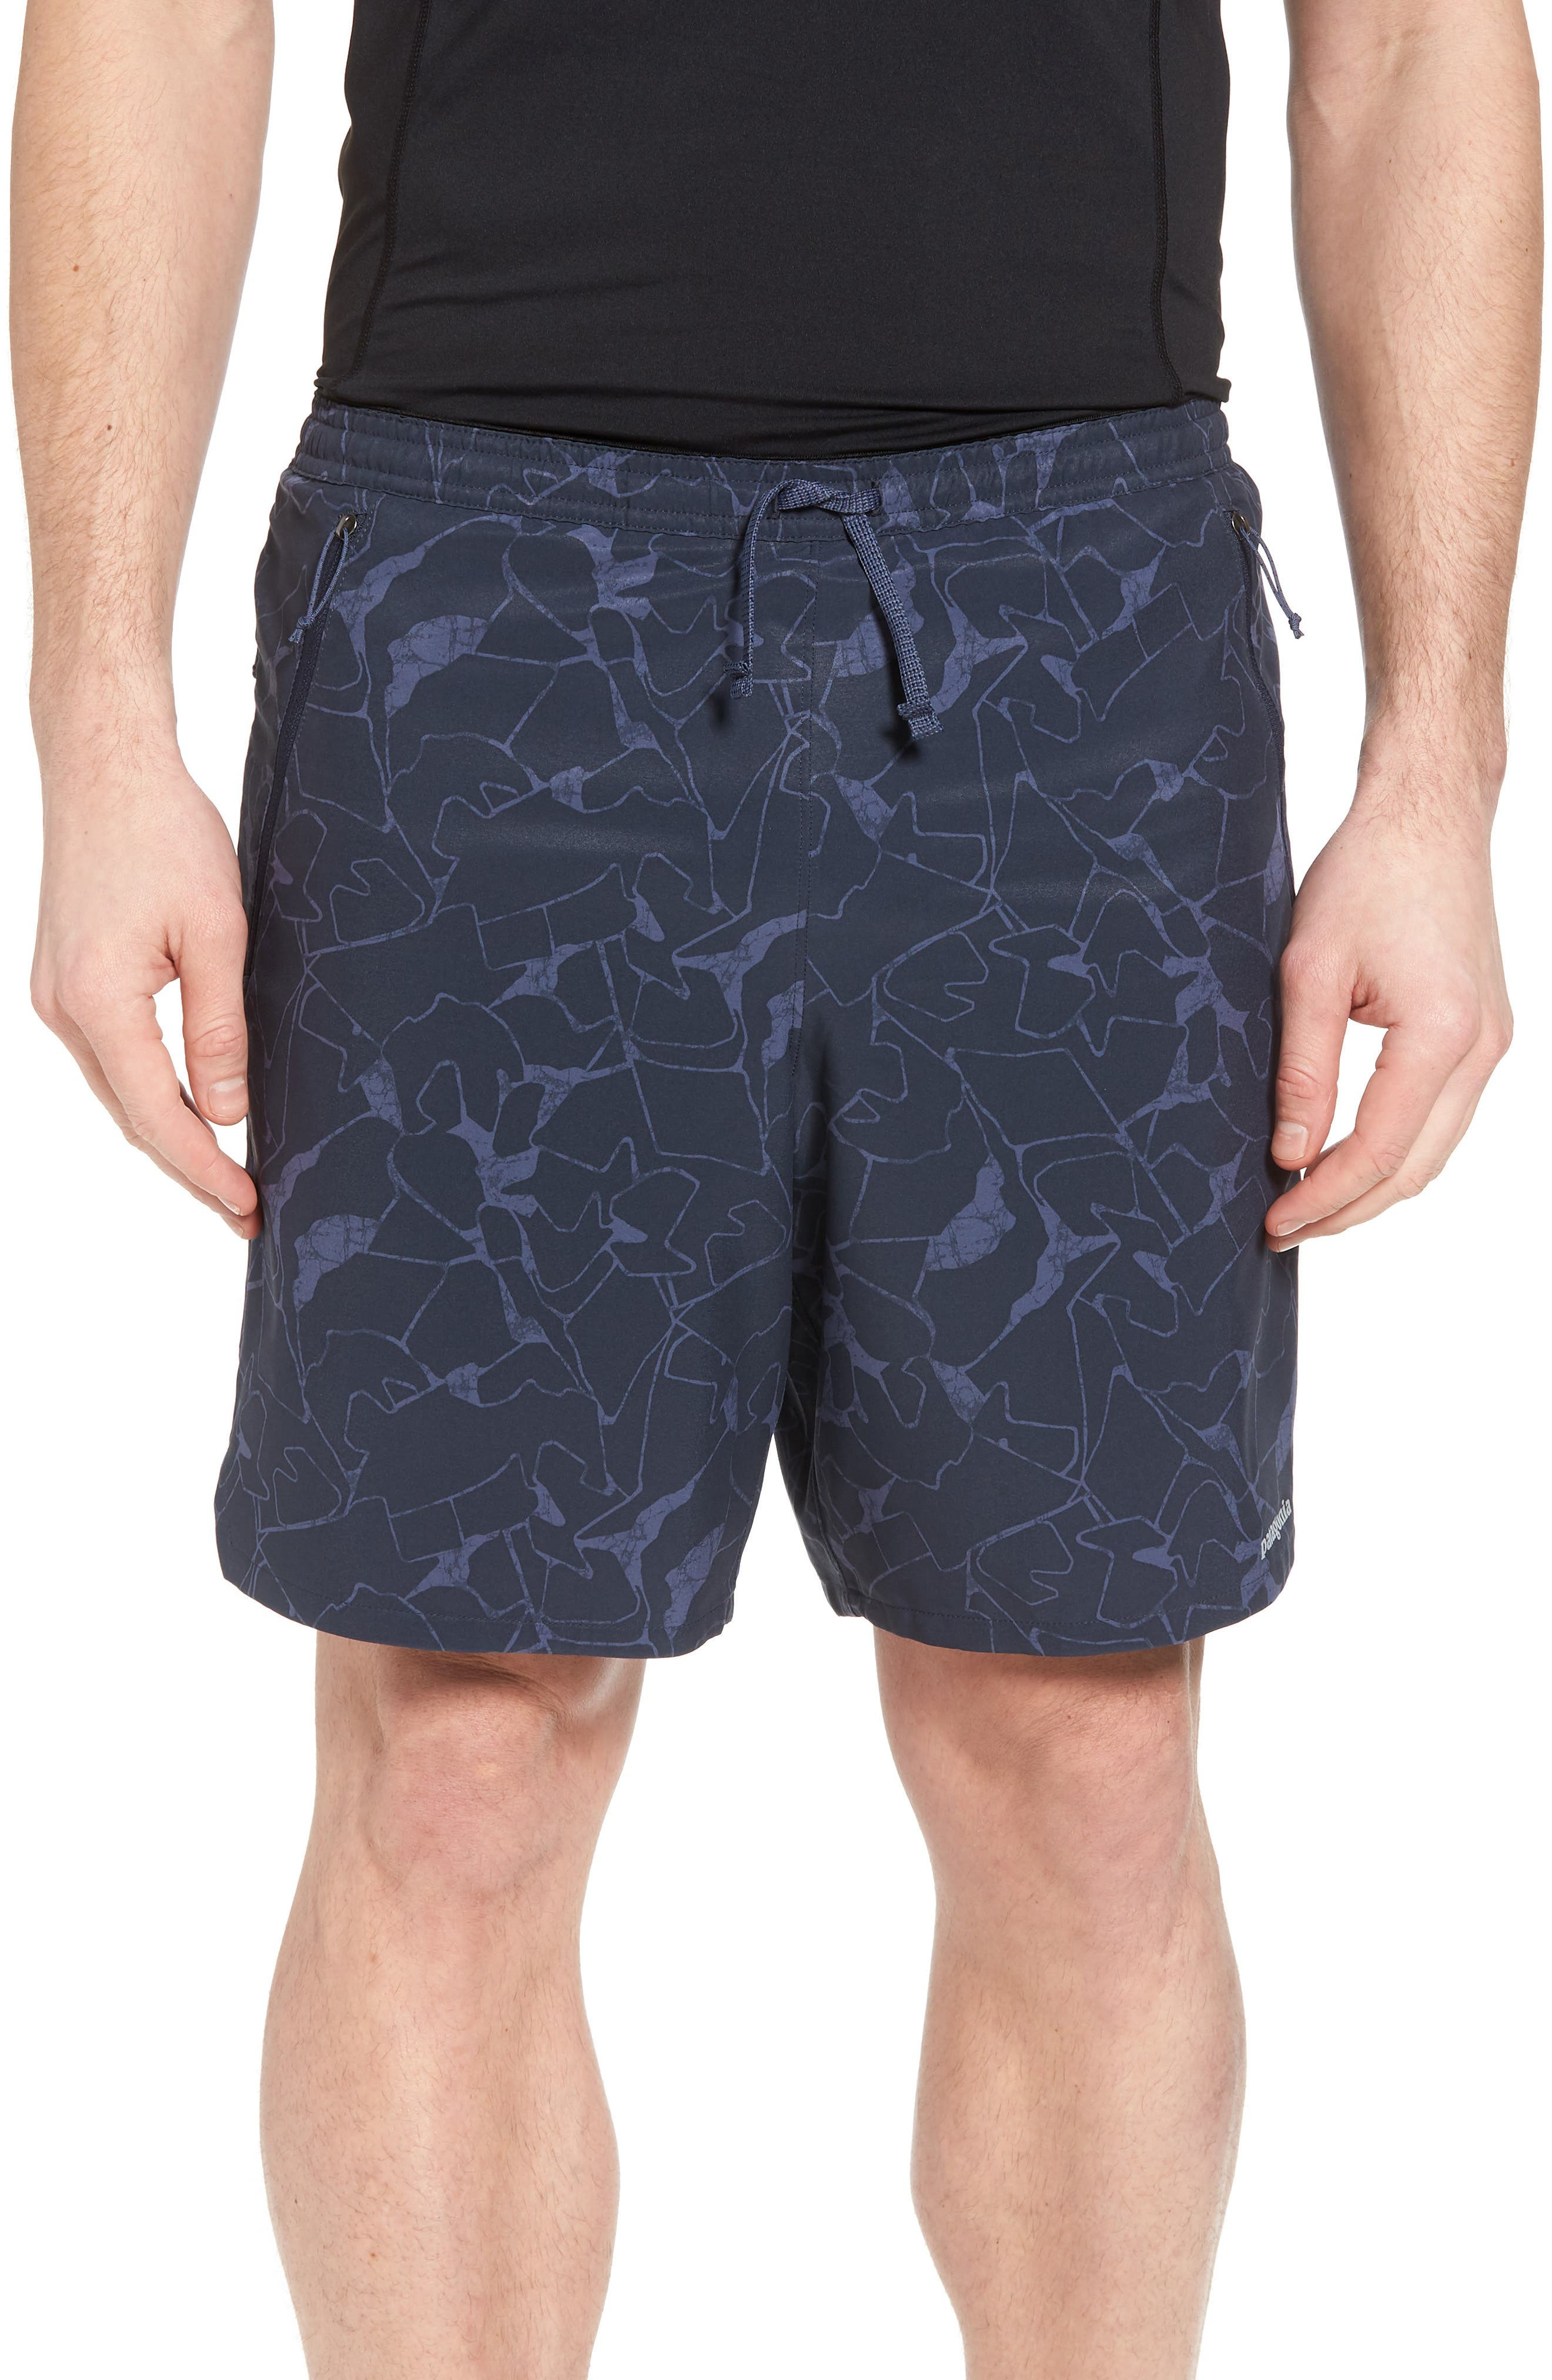 Nine Trails Hiking Shorts,                         Main,                         color, Rock Jigsaw/ Smolder Blue